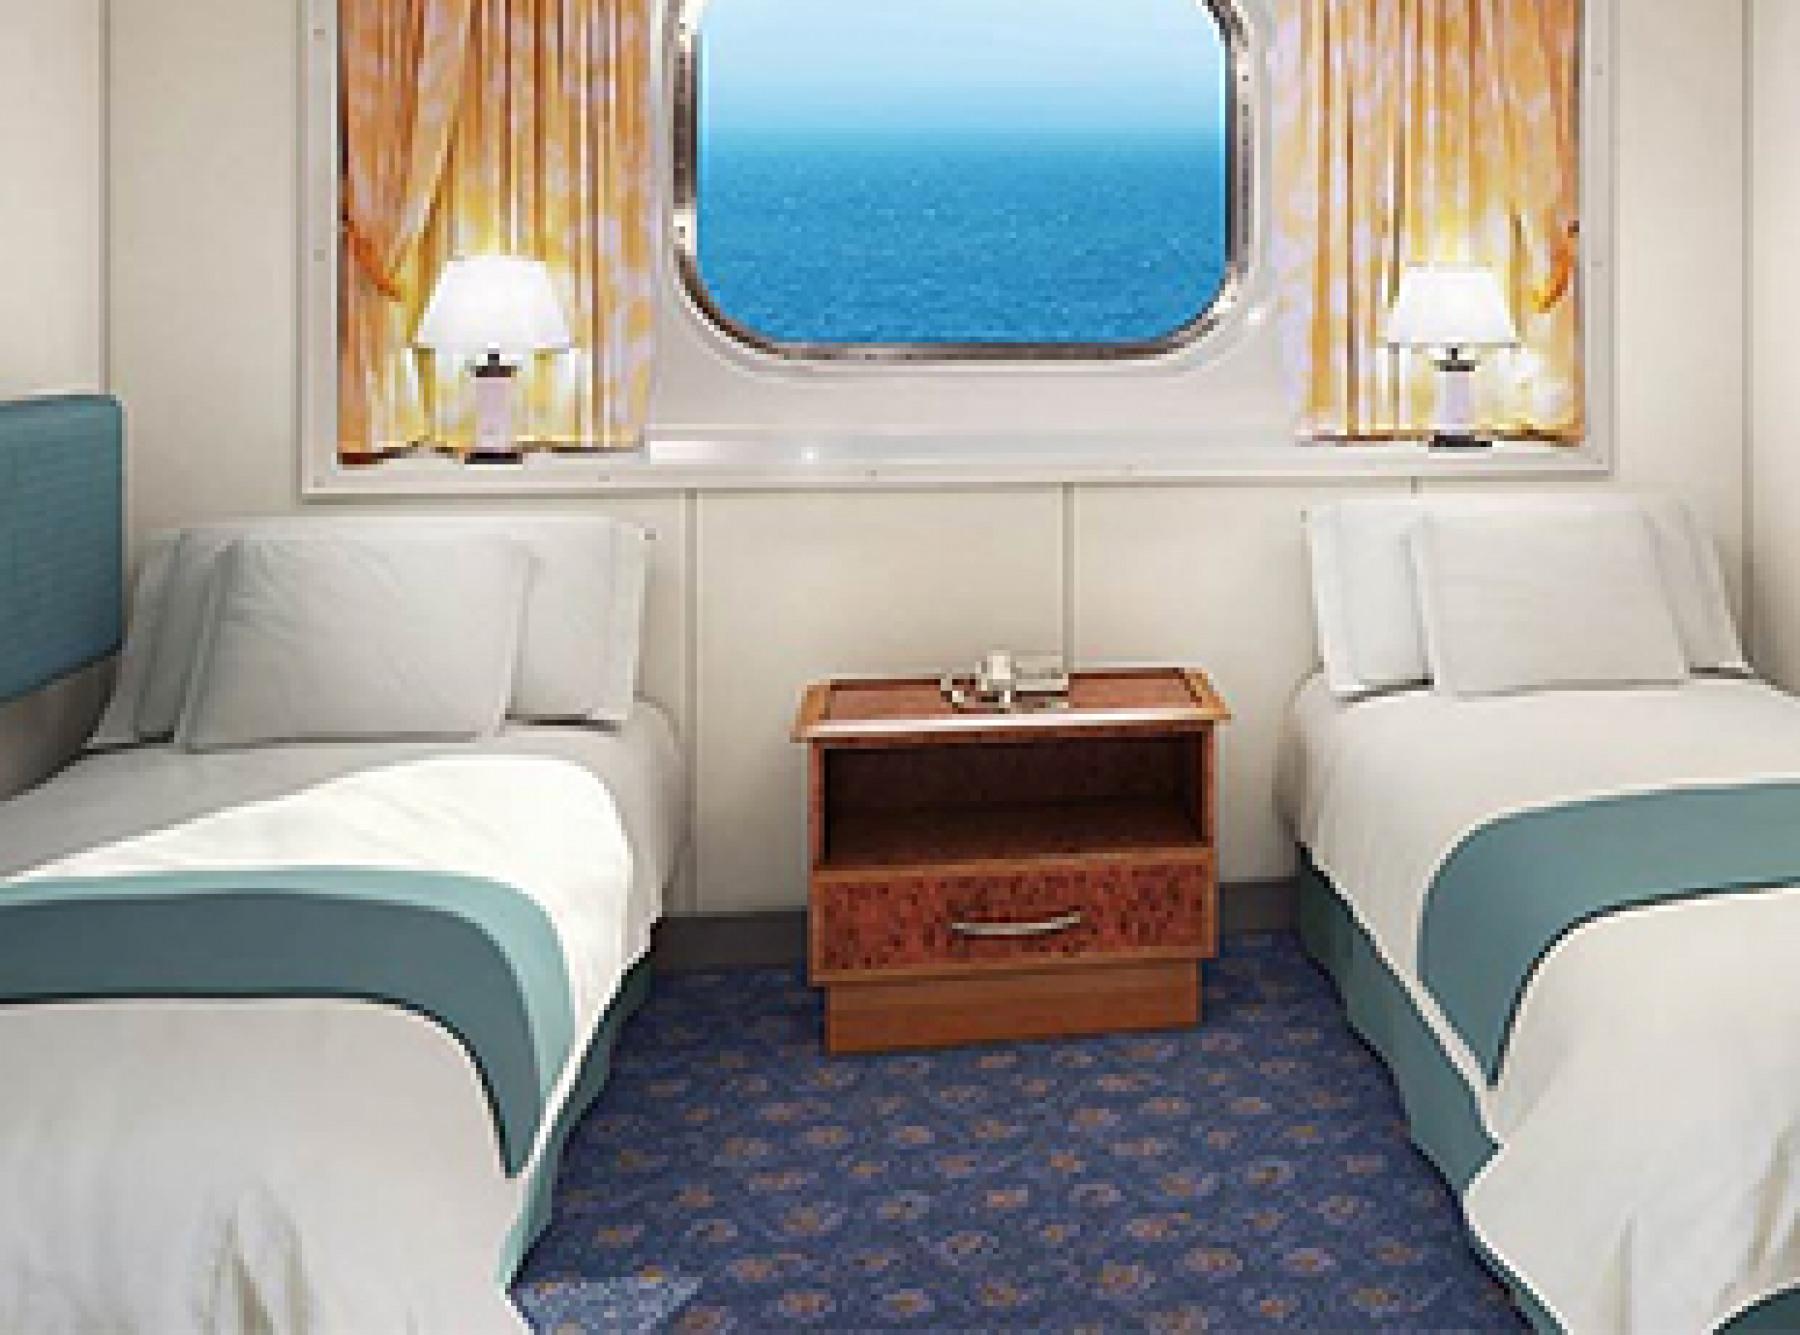 Norwegian Cruise Line Norwegian Spirit Accommodation Oceanview Picture.jpg